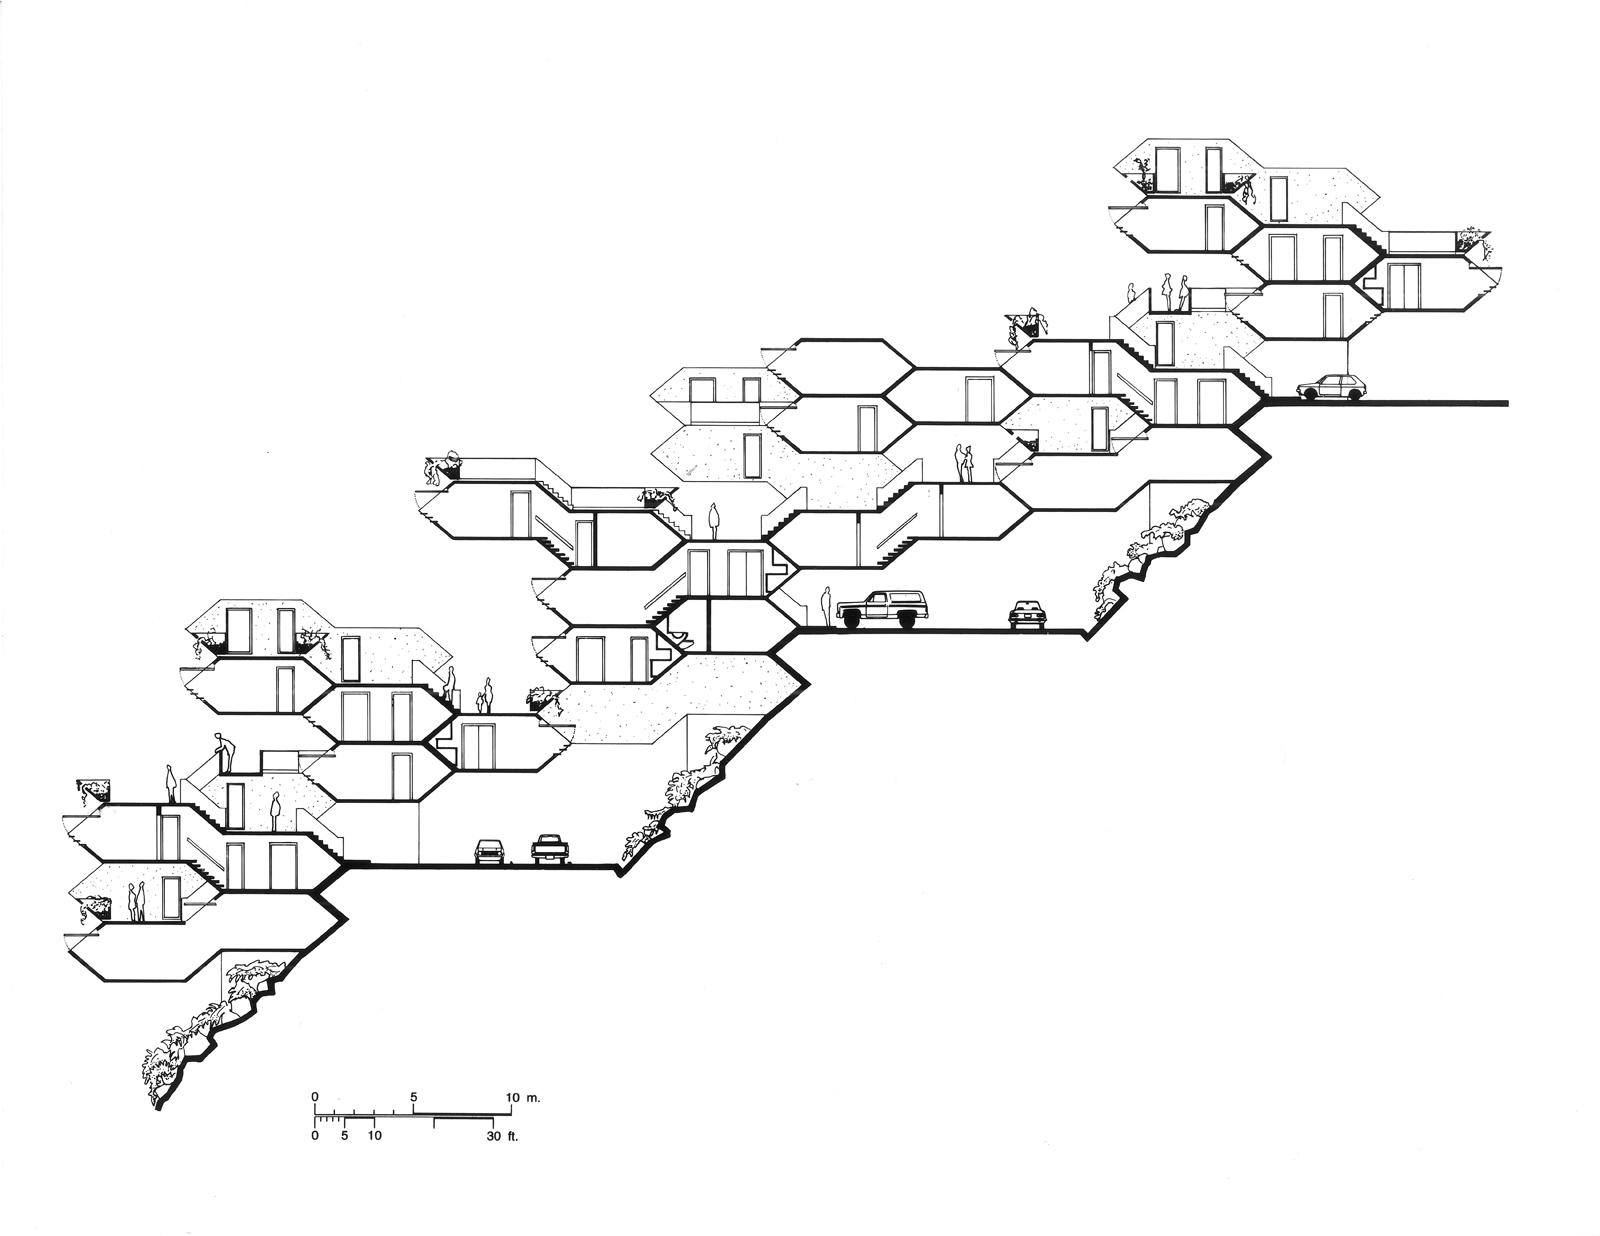 Habitat '67 building plan design by Moshe Safdie